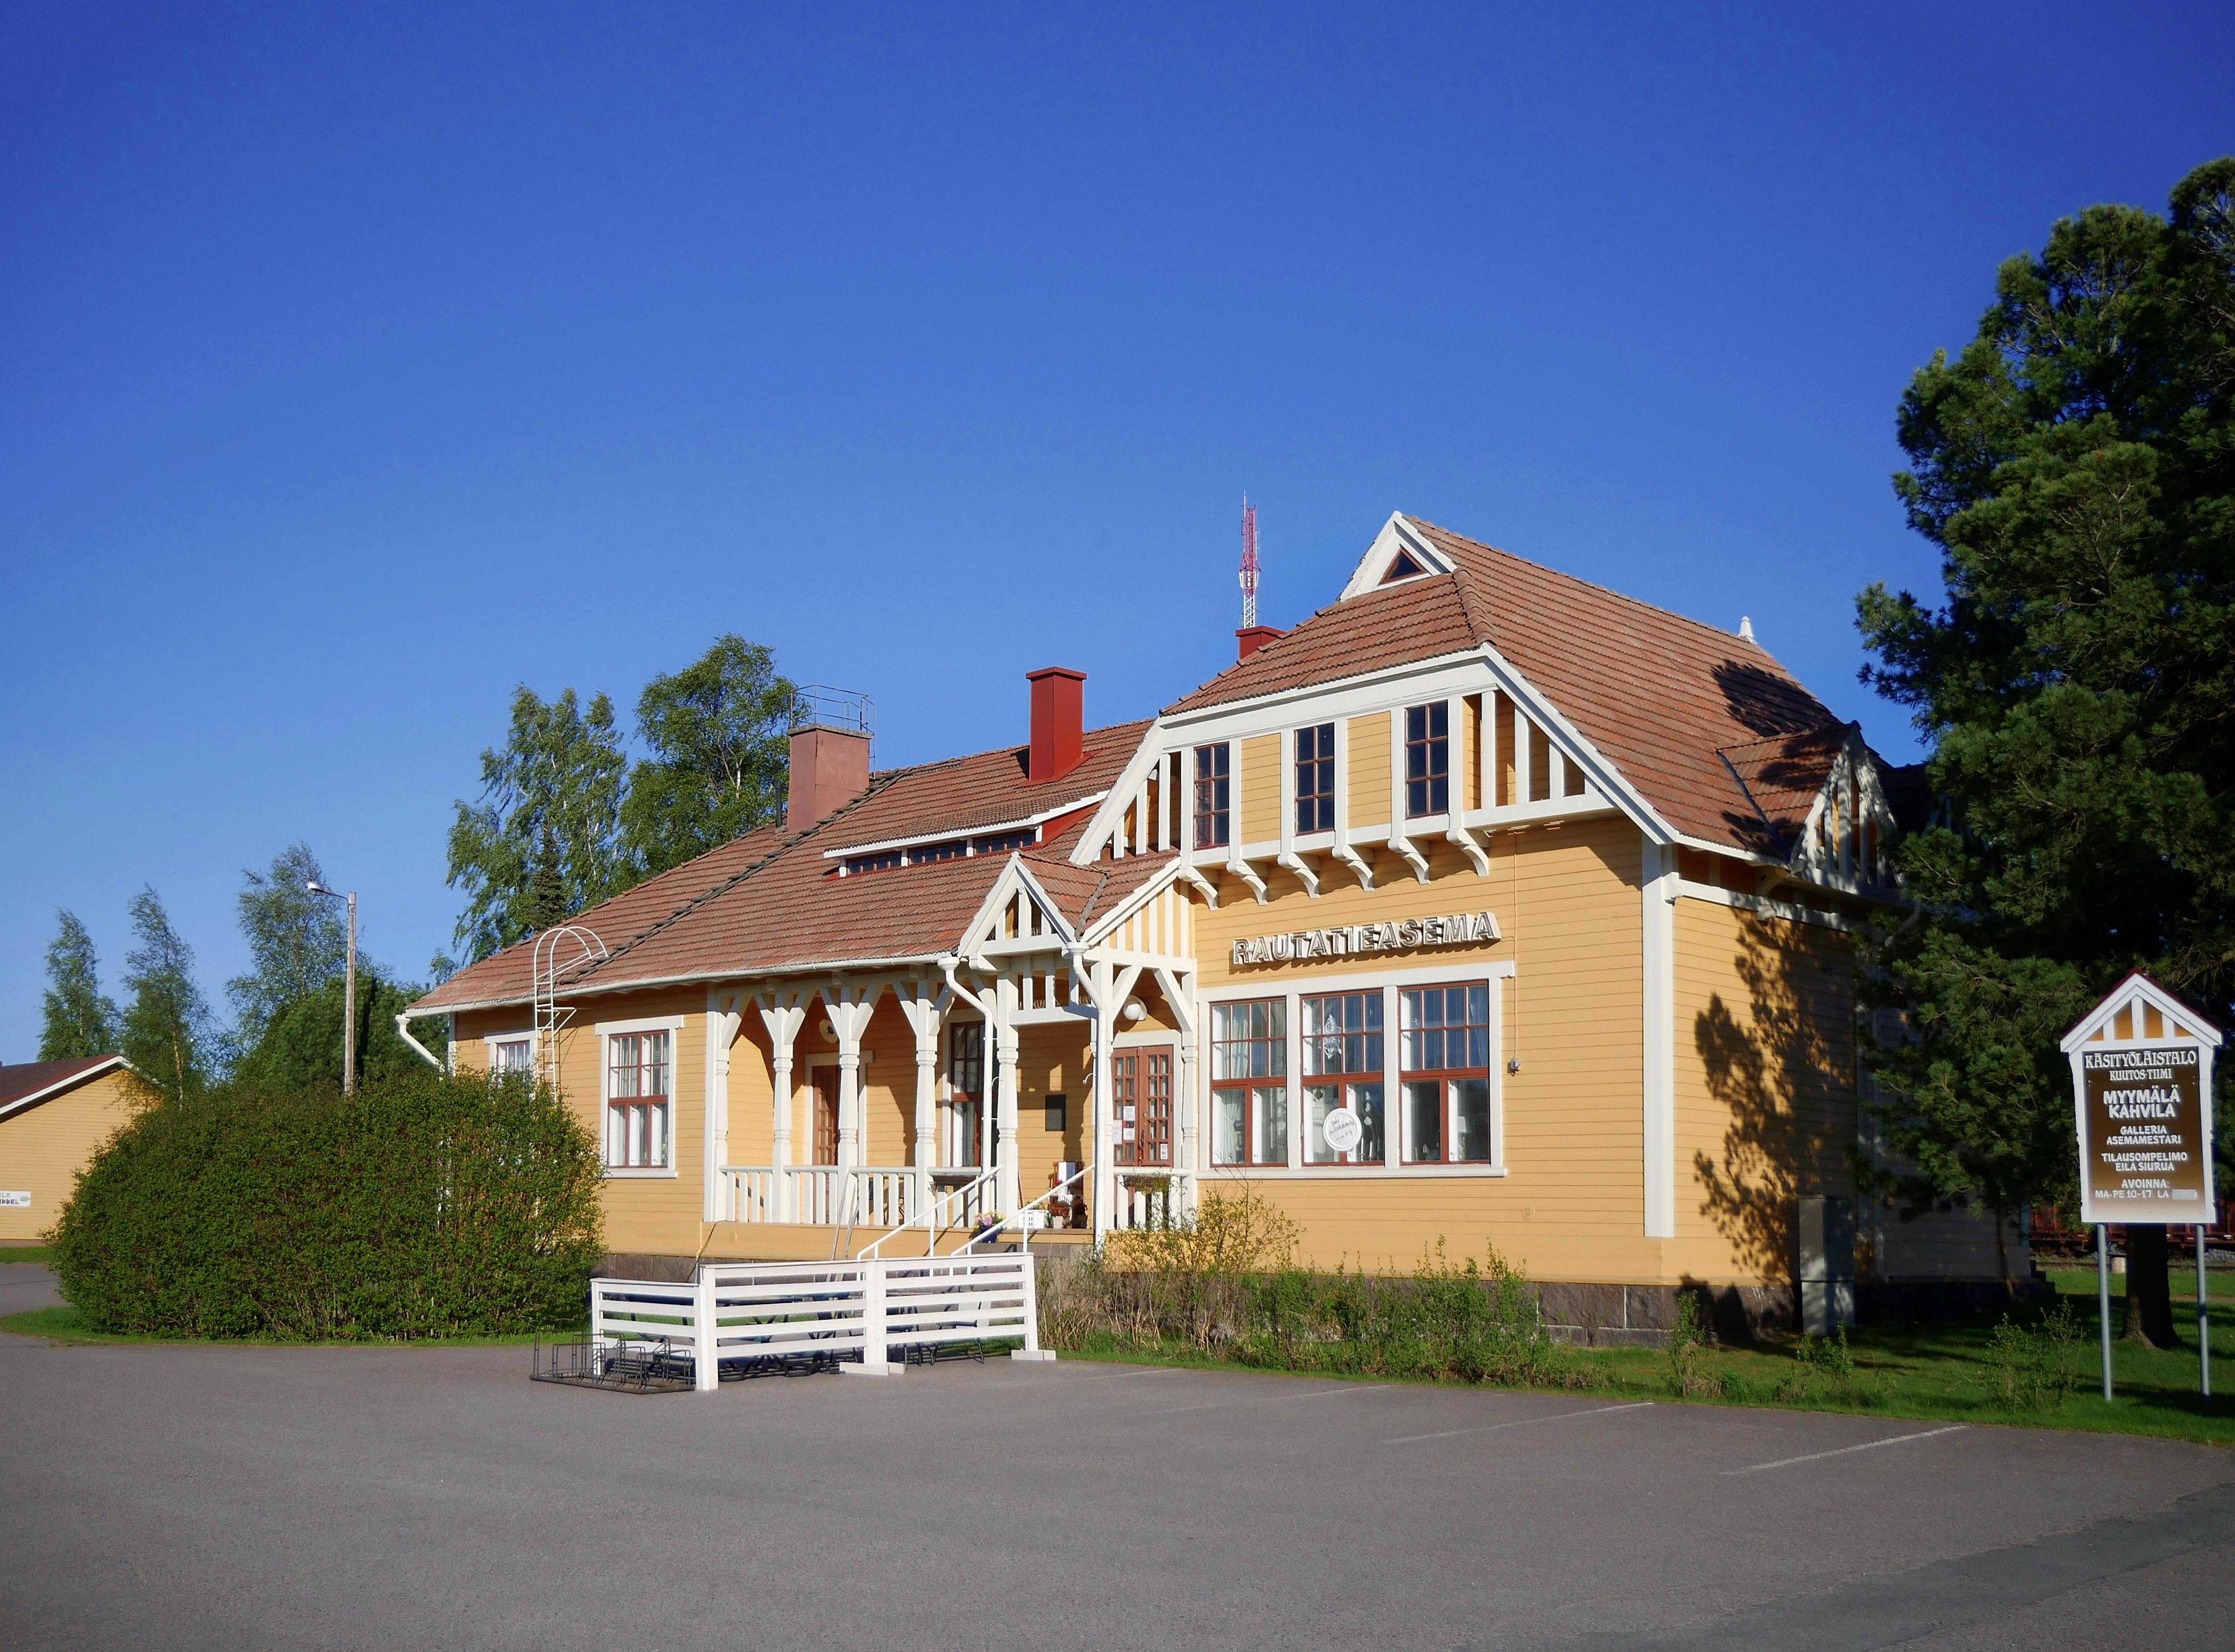 Raahe railway station 20180528.jpg